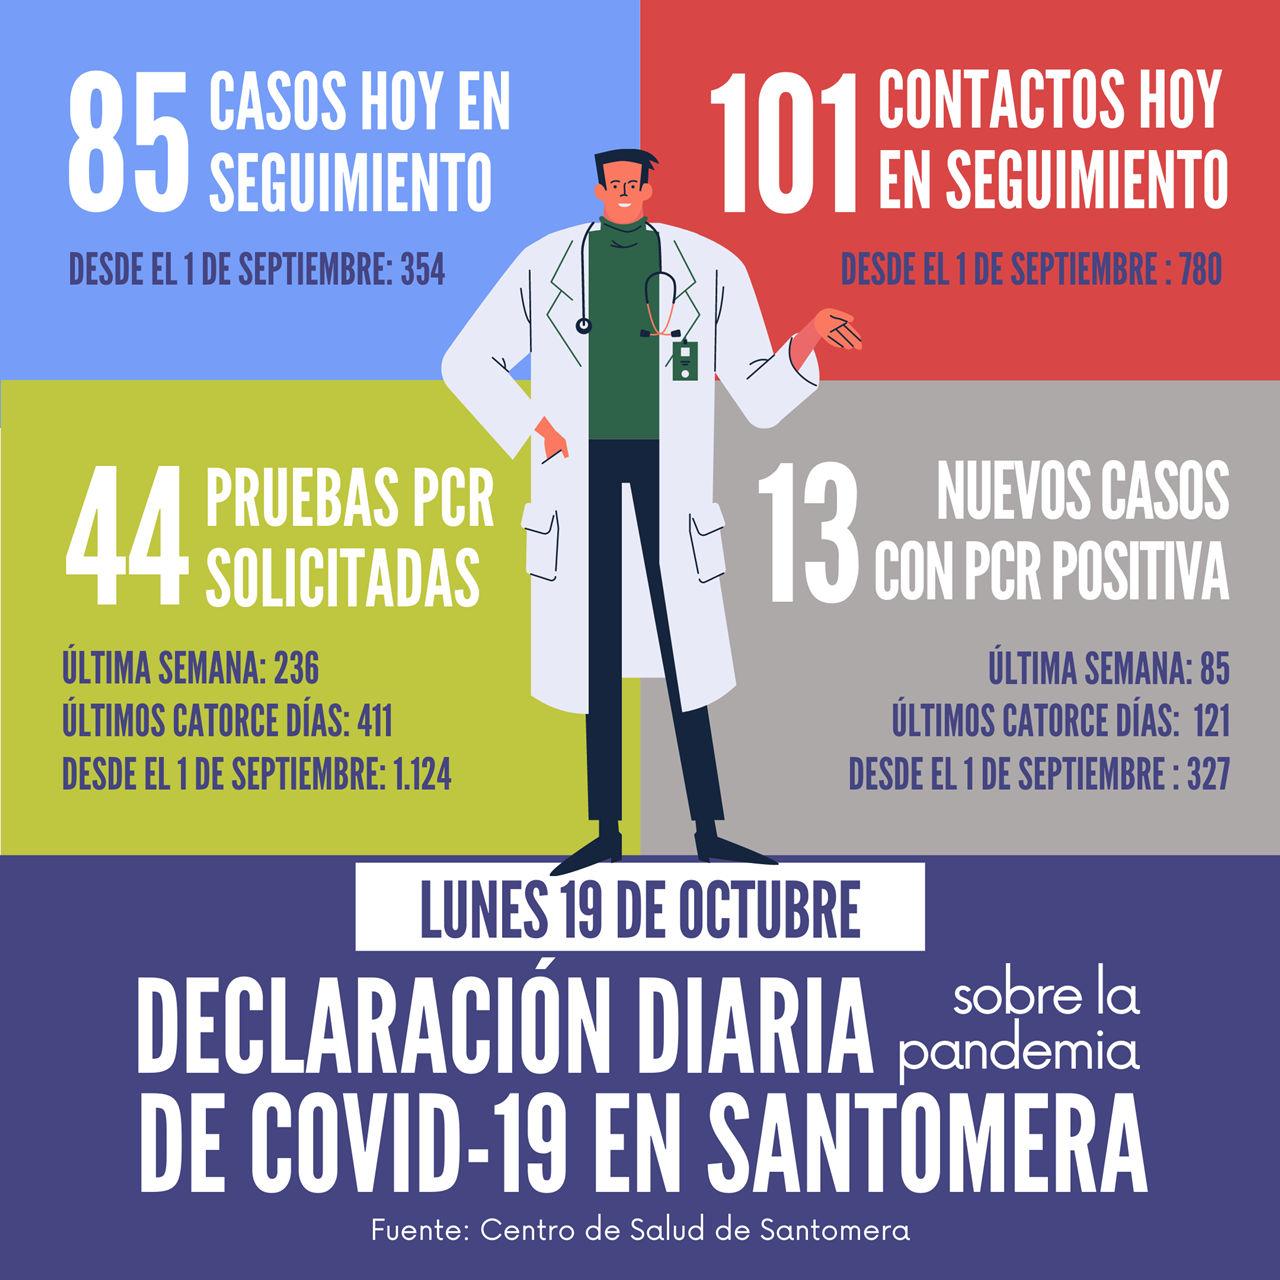 20201019_Datos COVID-19 Santomera